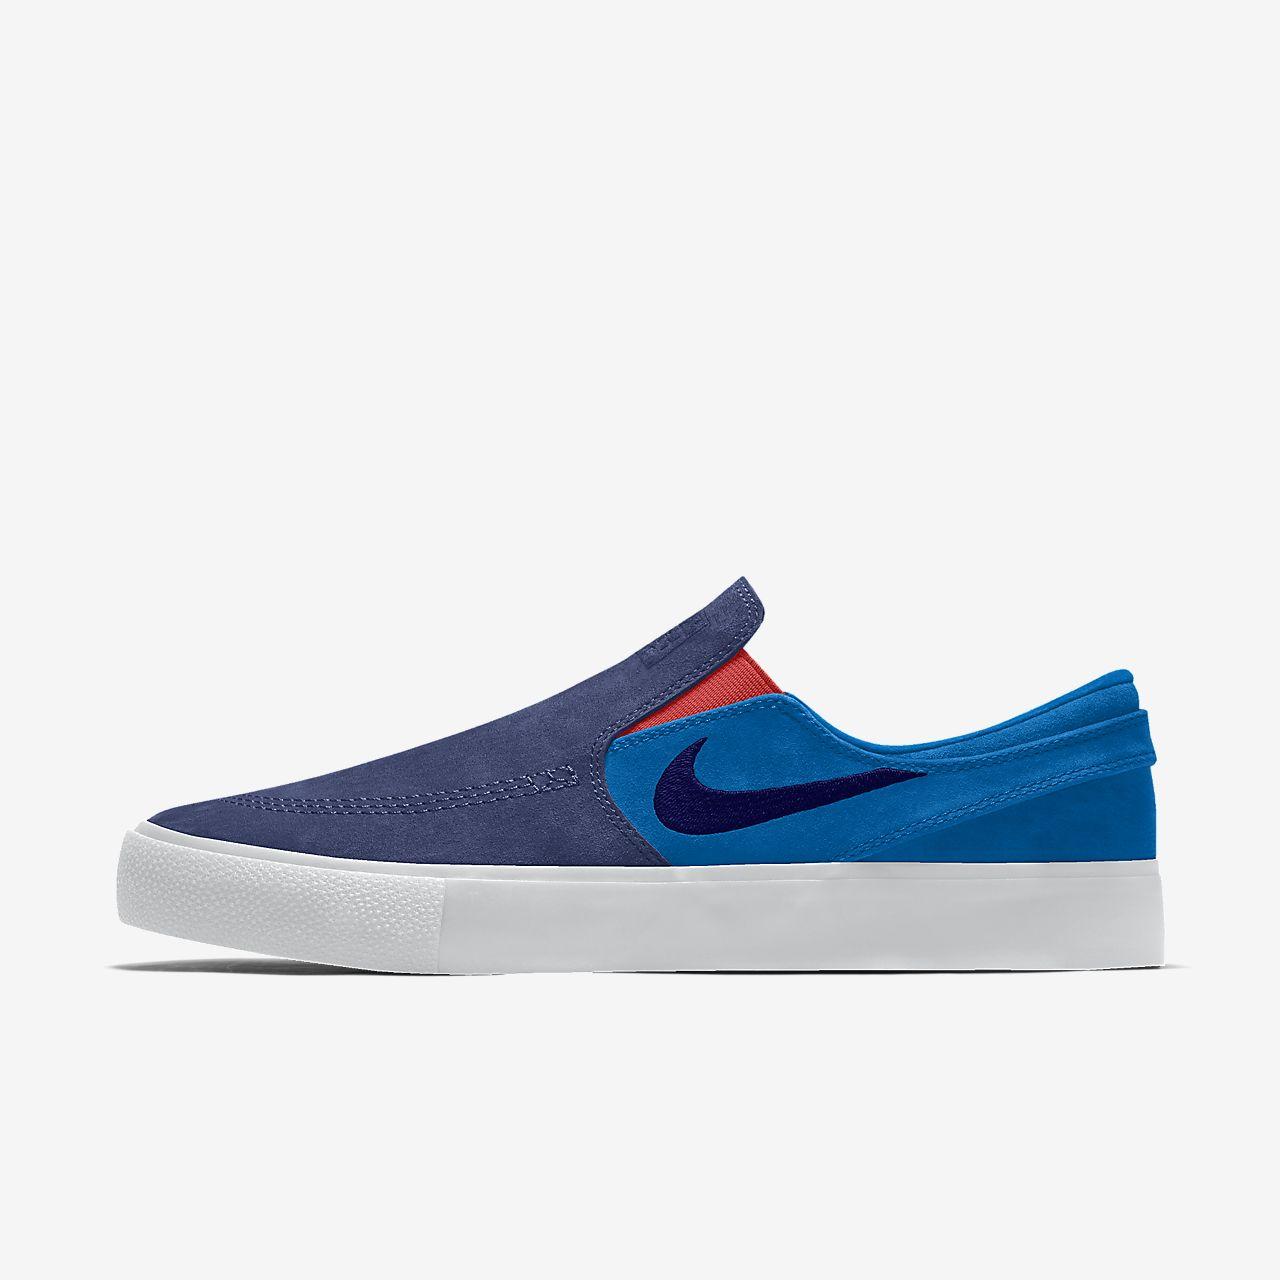 Nike SB Zoom Stefan Janoski Slip RM By You 专属定制滑板鞋